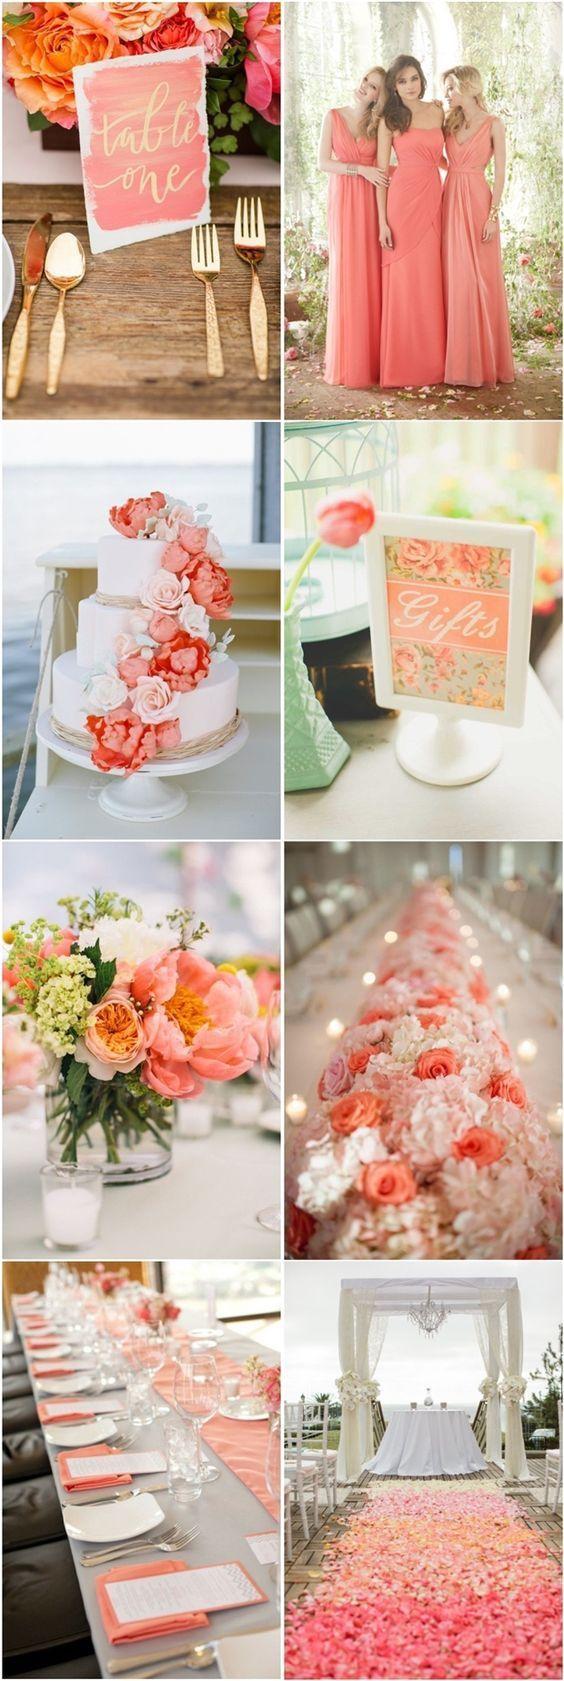 pin by samantha lingard on wedding ideas pinterest weddings